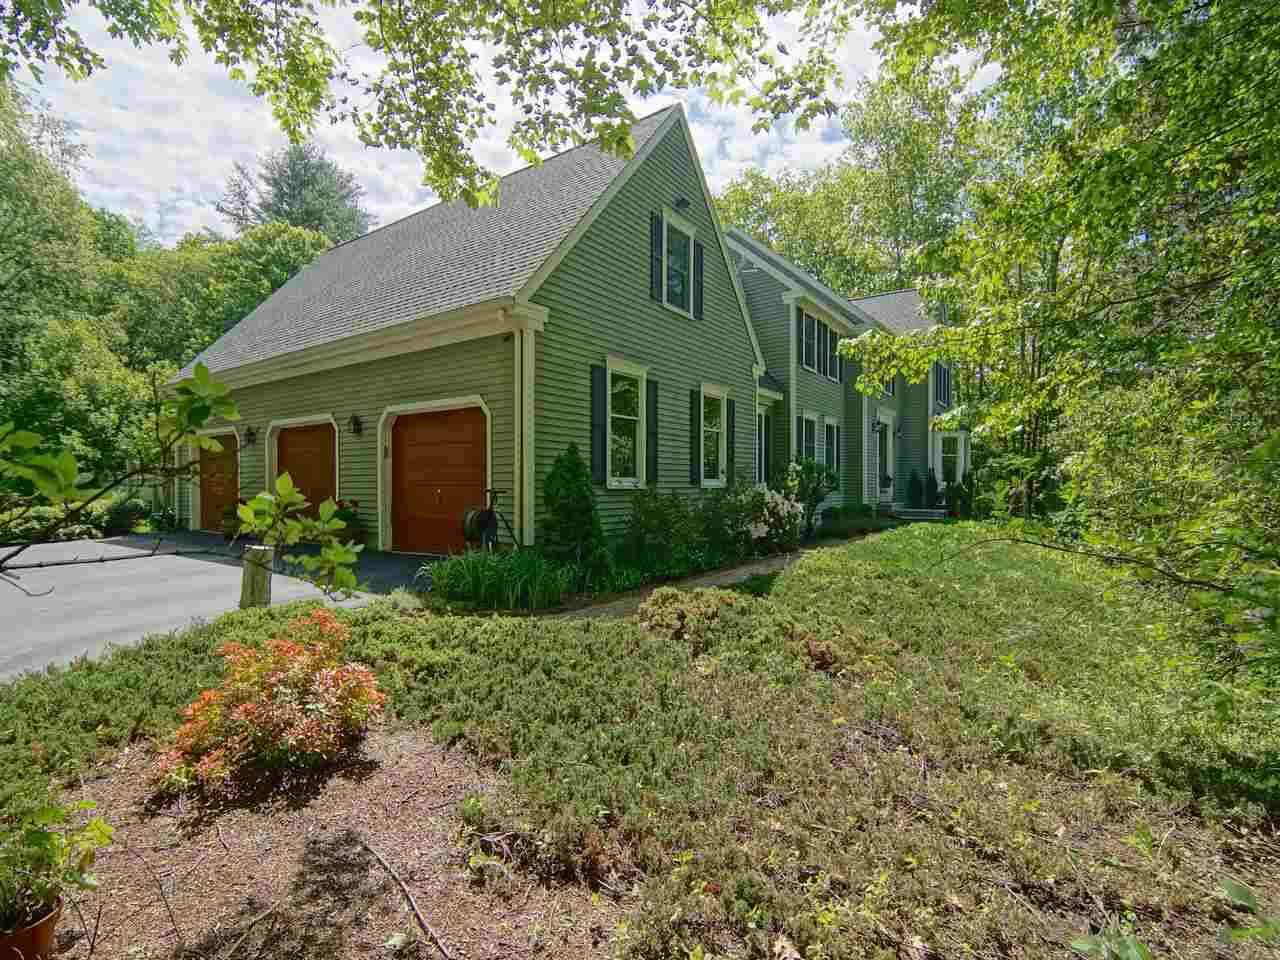 Single Family for Sale at 5 Victoria Drive Hampton Falls, New Hampshire 03844 United States